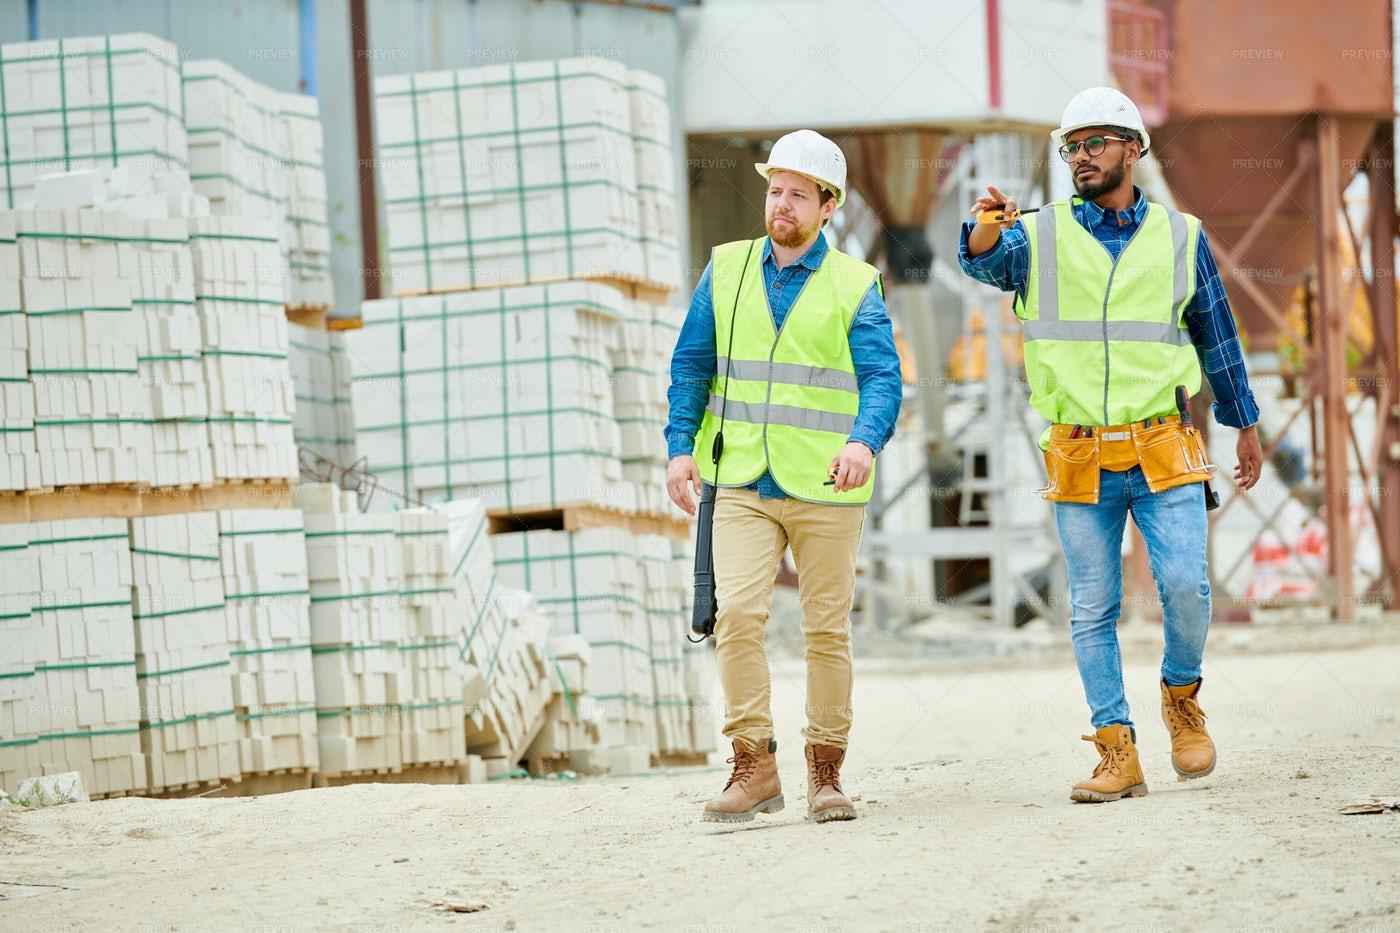 Building Inspectors Walking On...: Stock Photos